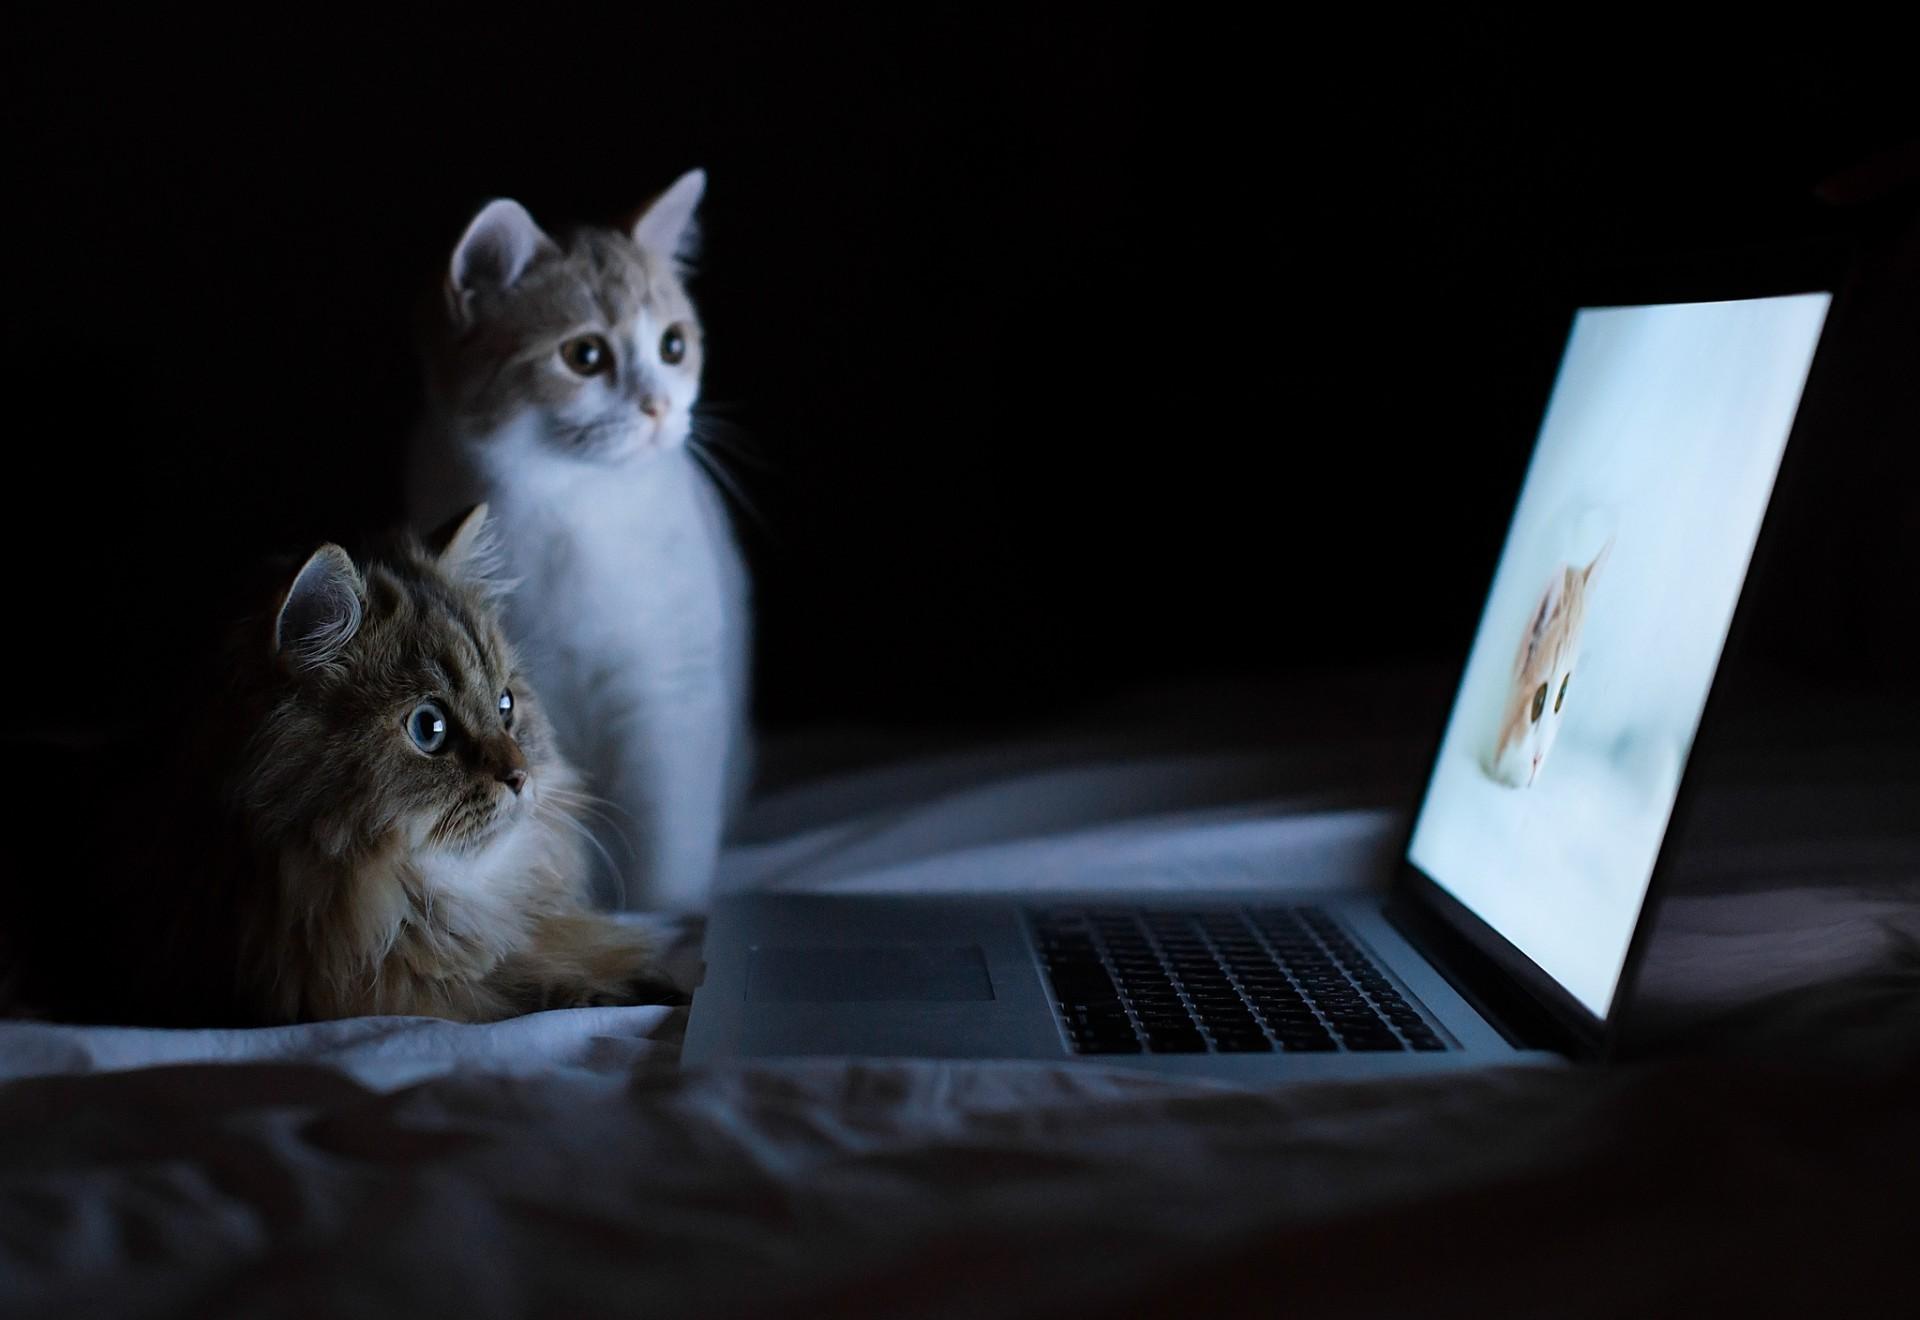 Два кота наблюдают за кошкой на экране ...: million-wallpapers.ru/wallpaper/dva-kota-nablyudayut-za-koshkoj-na...